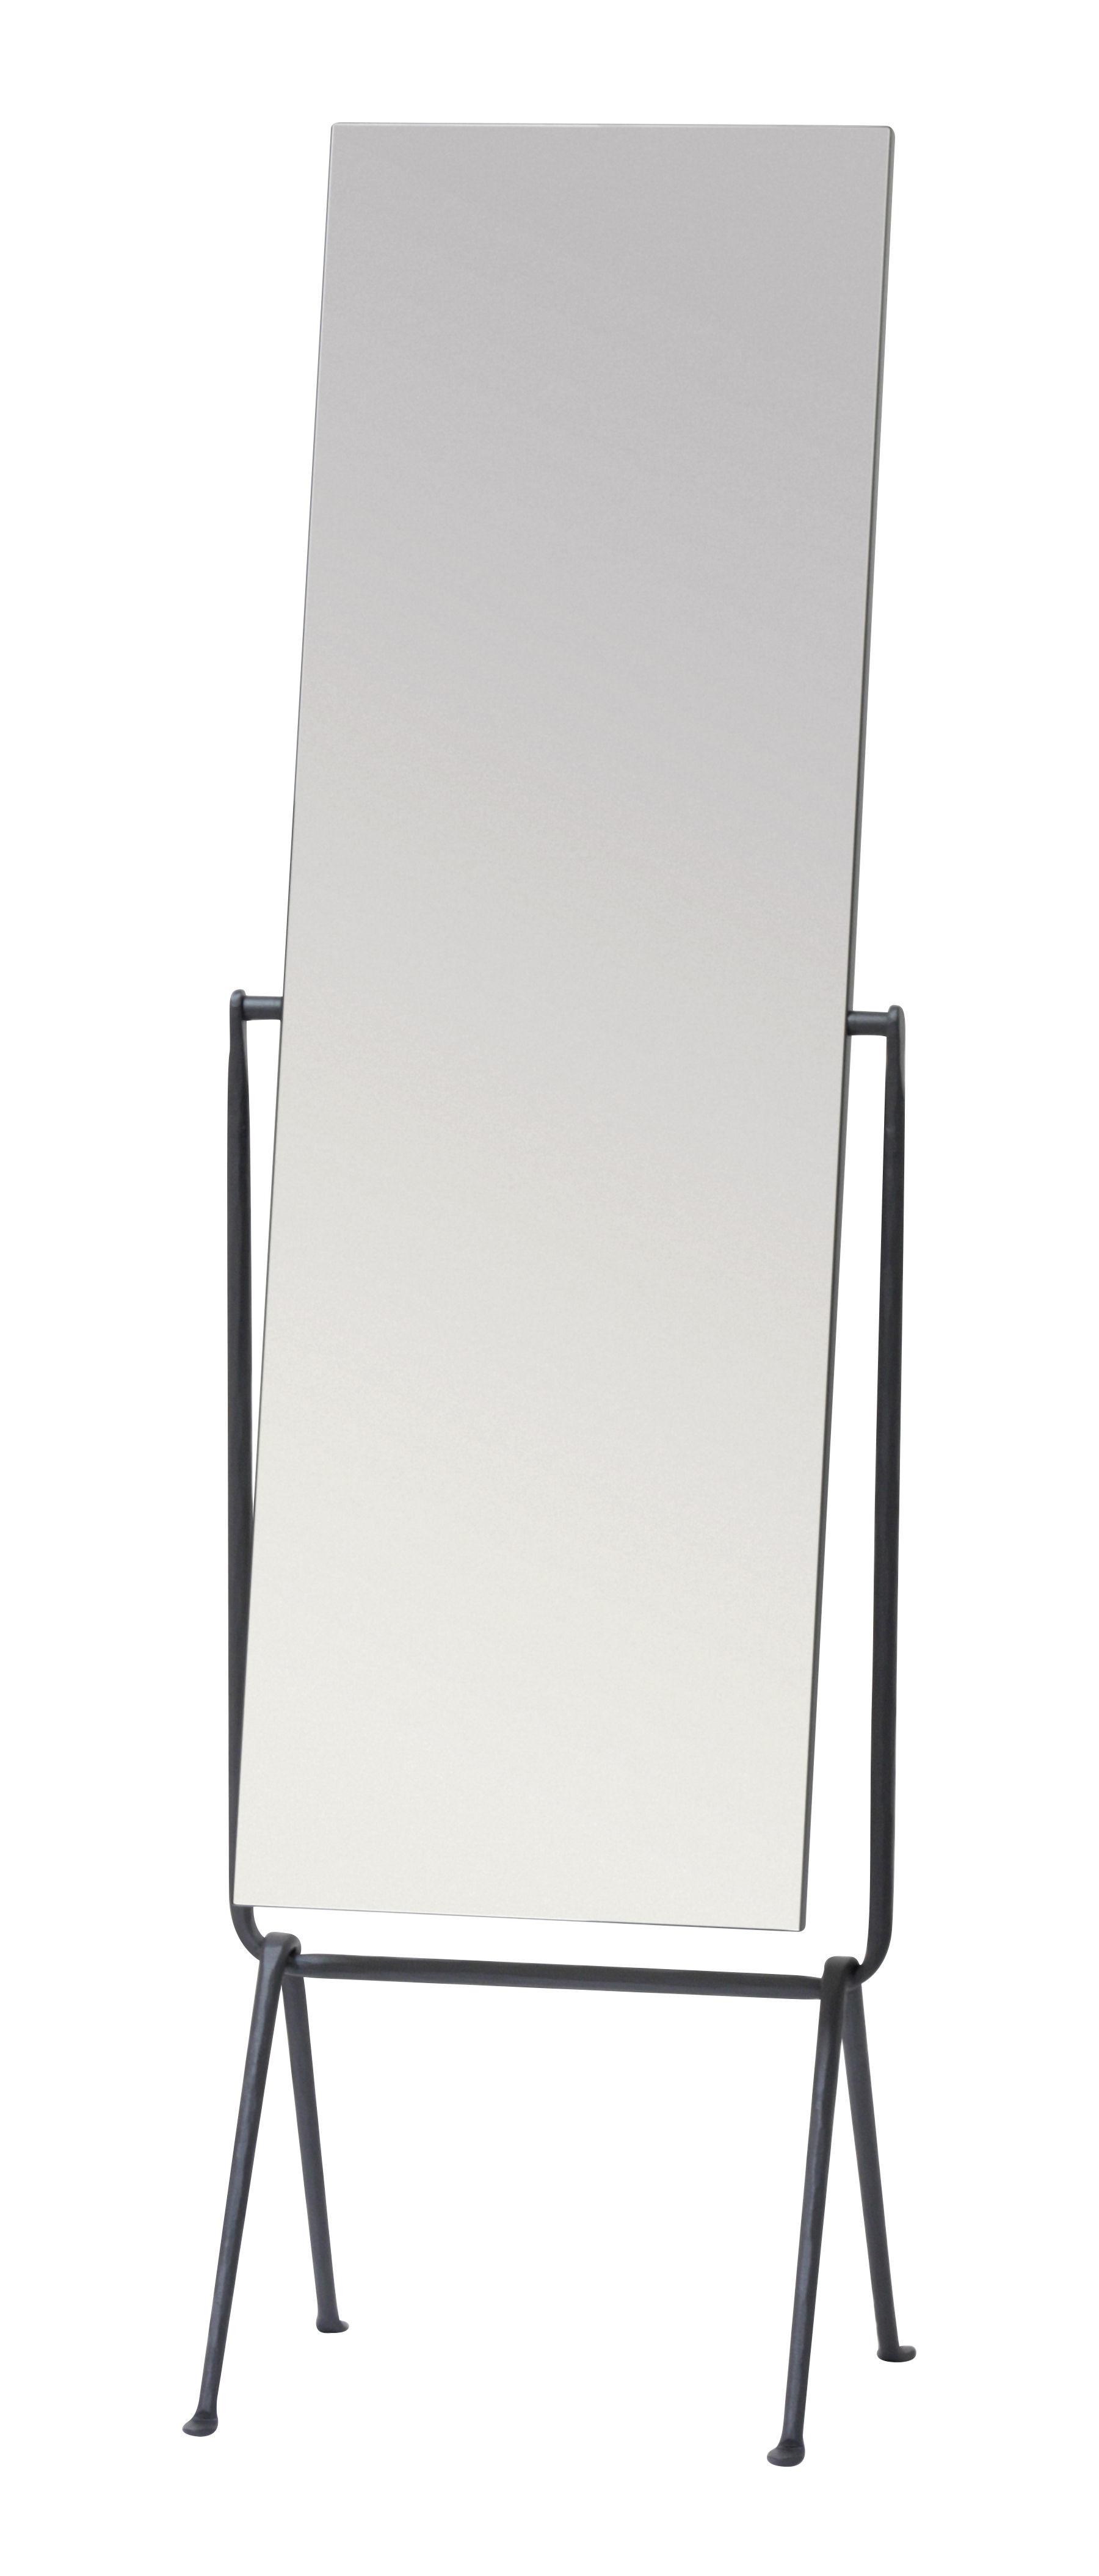 Miroir sur pied Officina Magis - Noir | Made In Design